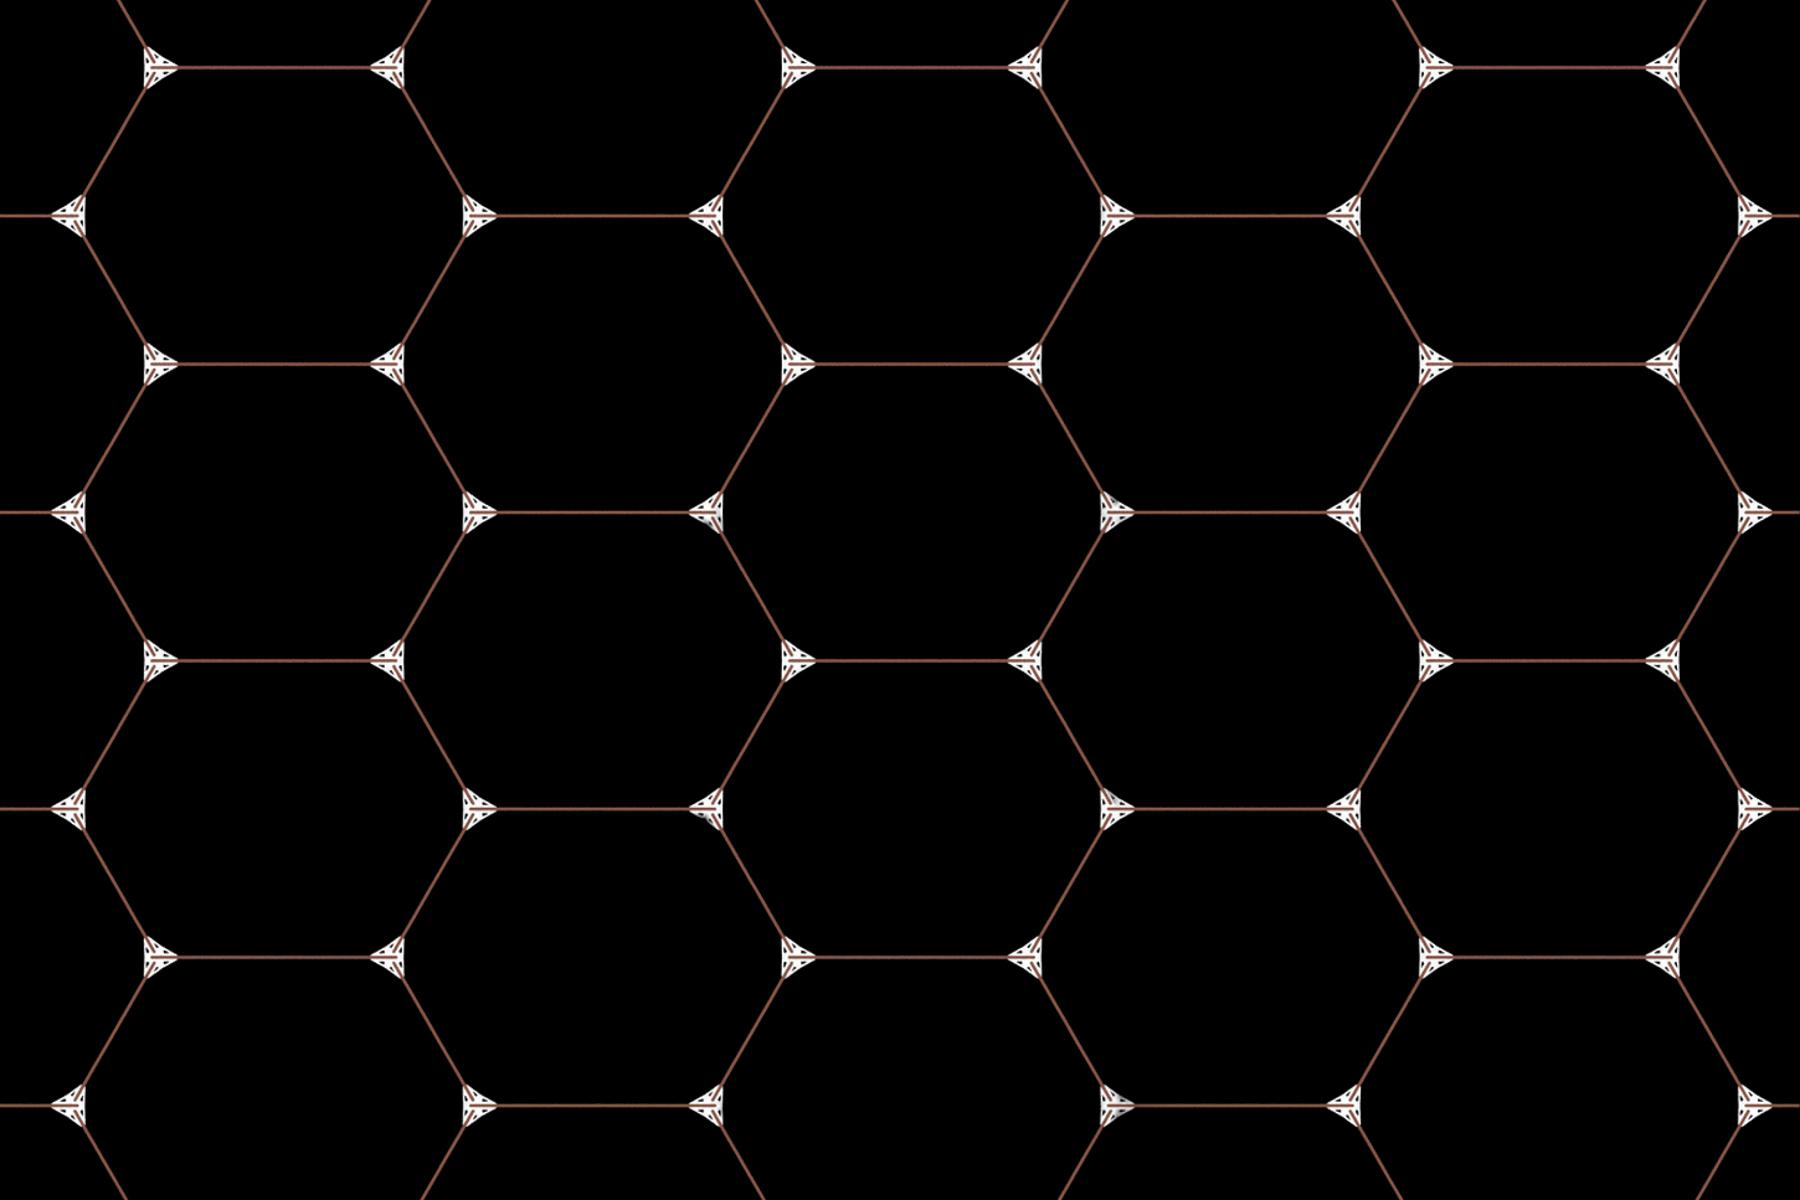 print-to-built-hellodesign-01.jpg